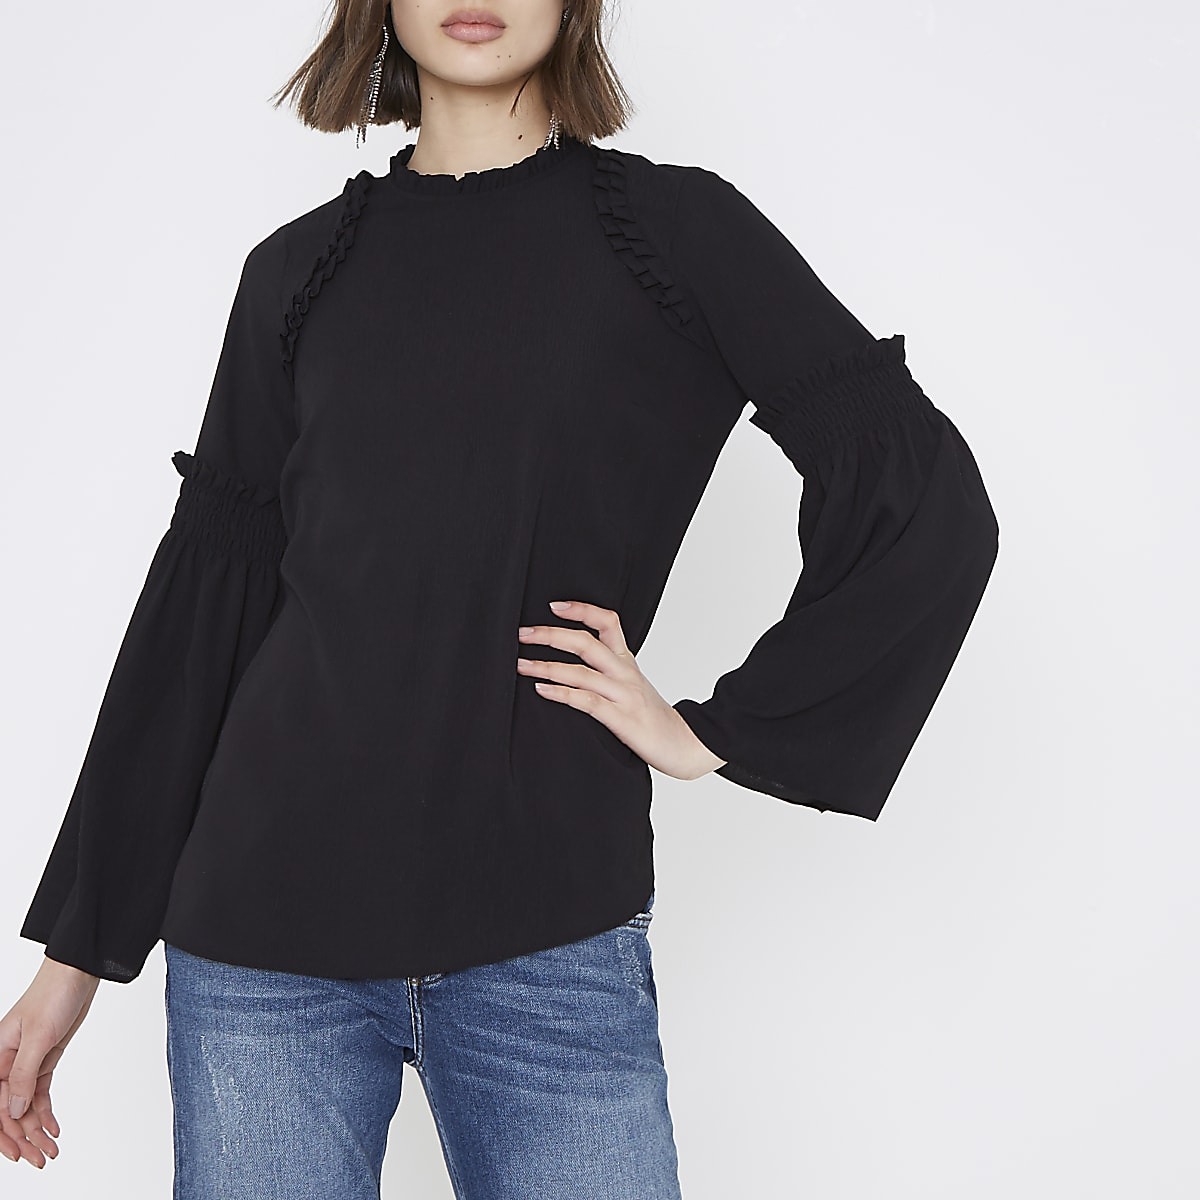 Black high neck frill bell sleeve blouse